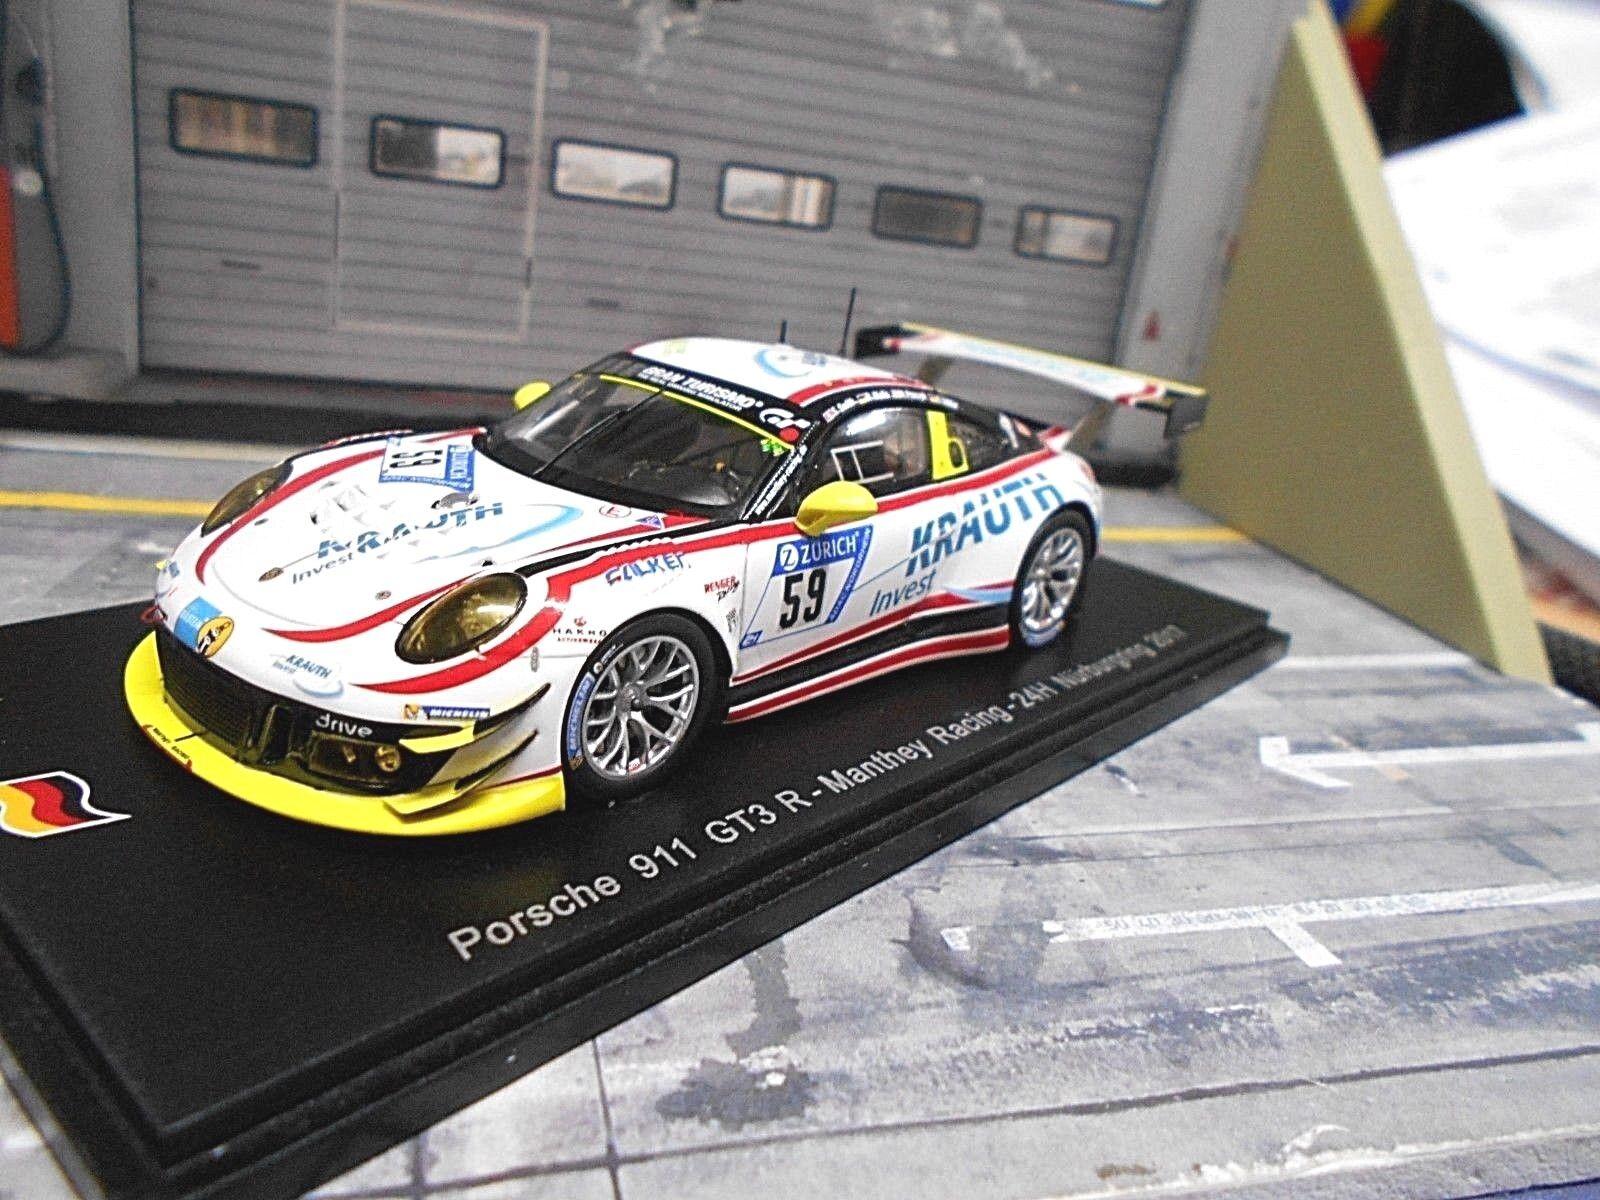 PORSCHE 911 991 GT3 R Manthey 24h Nürburgring 2017 Krauth  59 Müller Spark 1 43